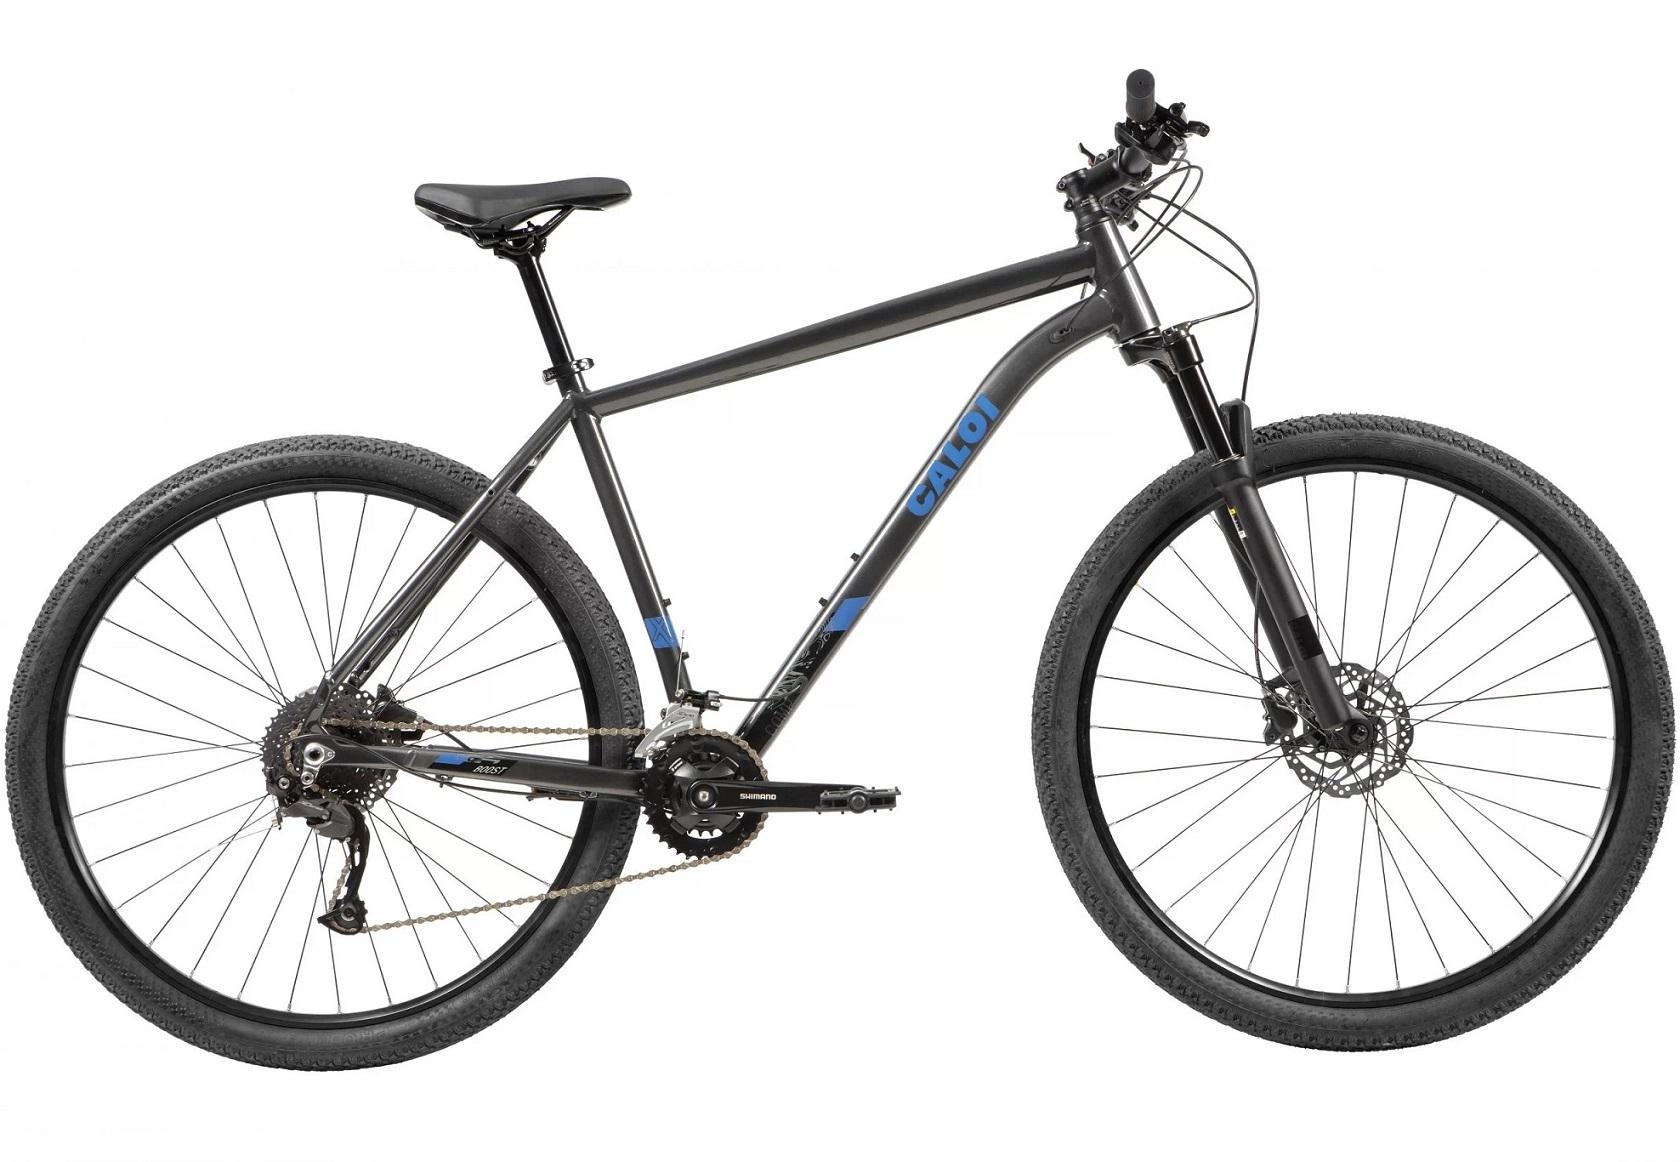 BICICLETA 29 CALOI EXPLORER COMP ALIVIO 2X9 CINZA (2021)